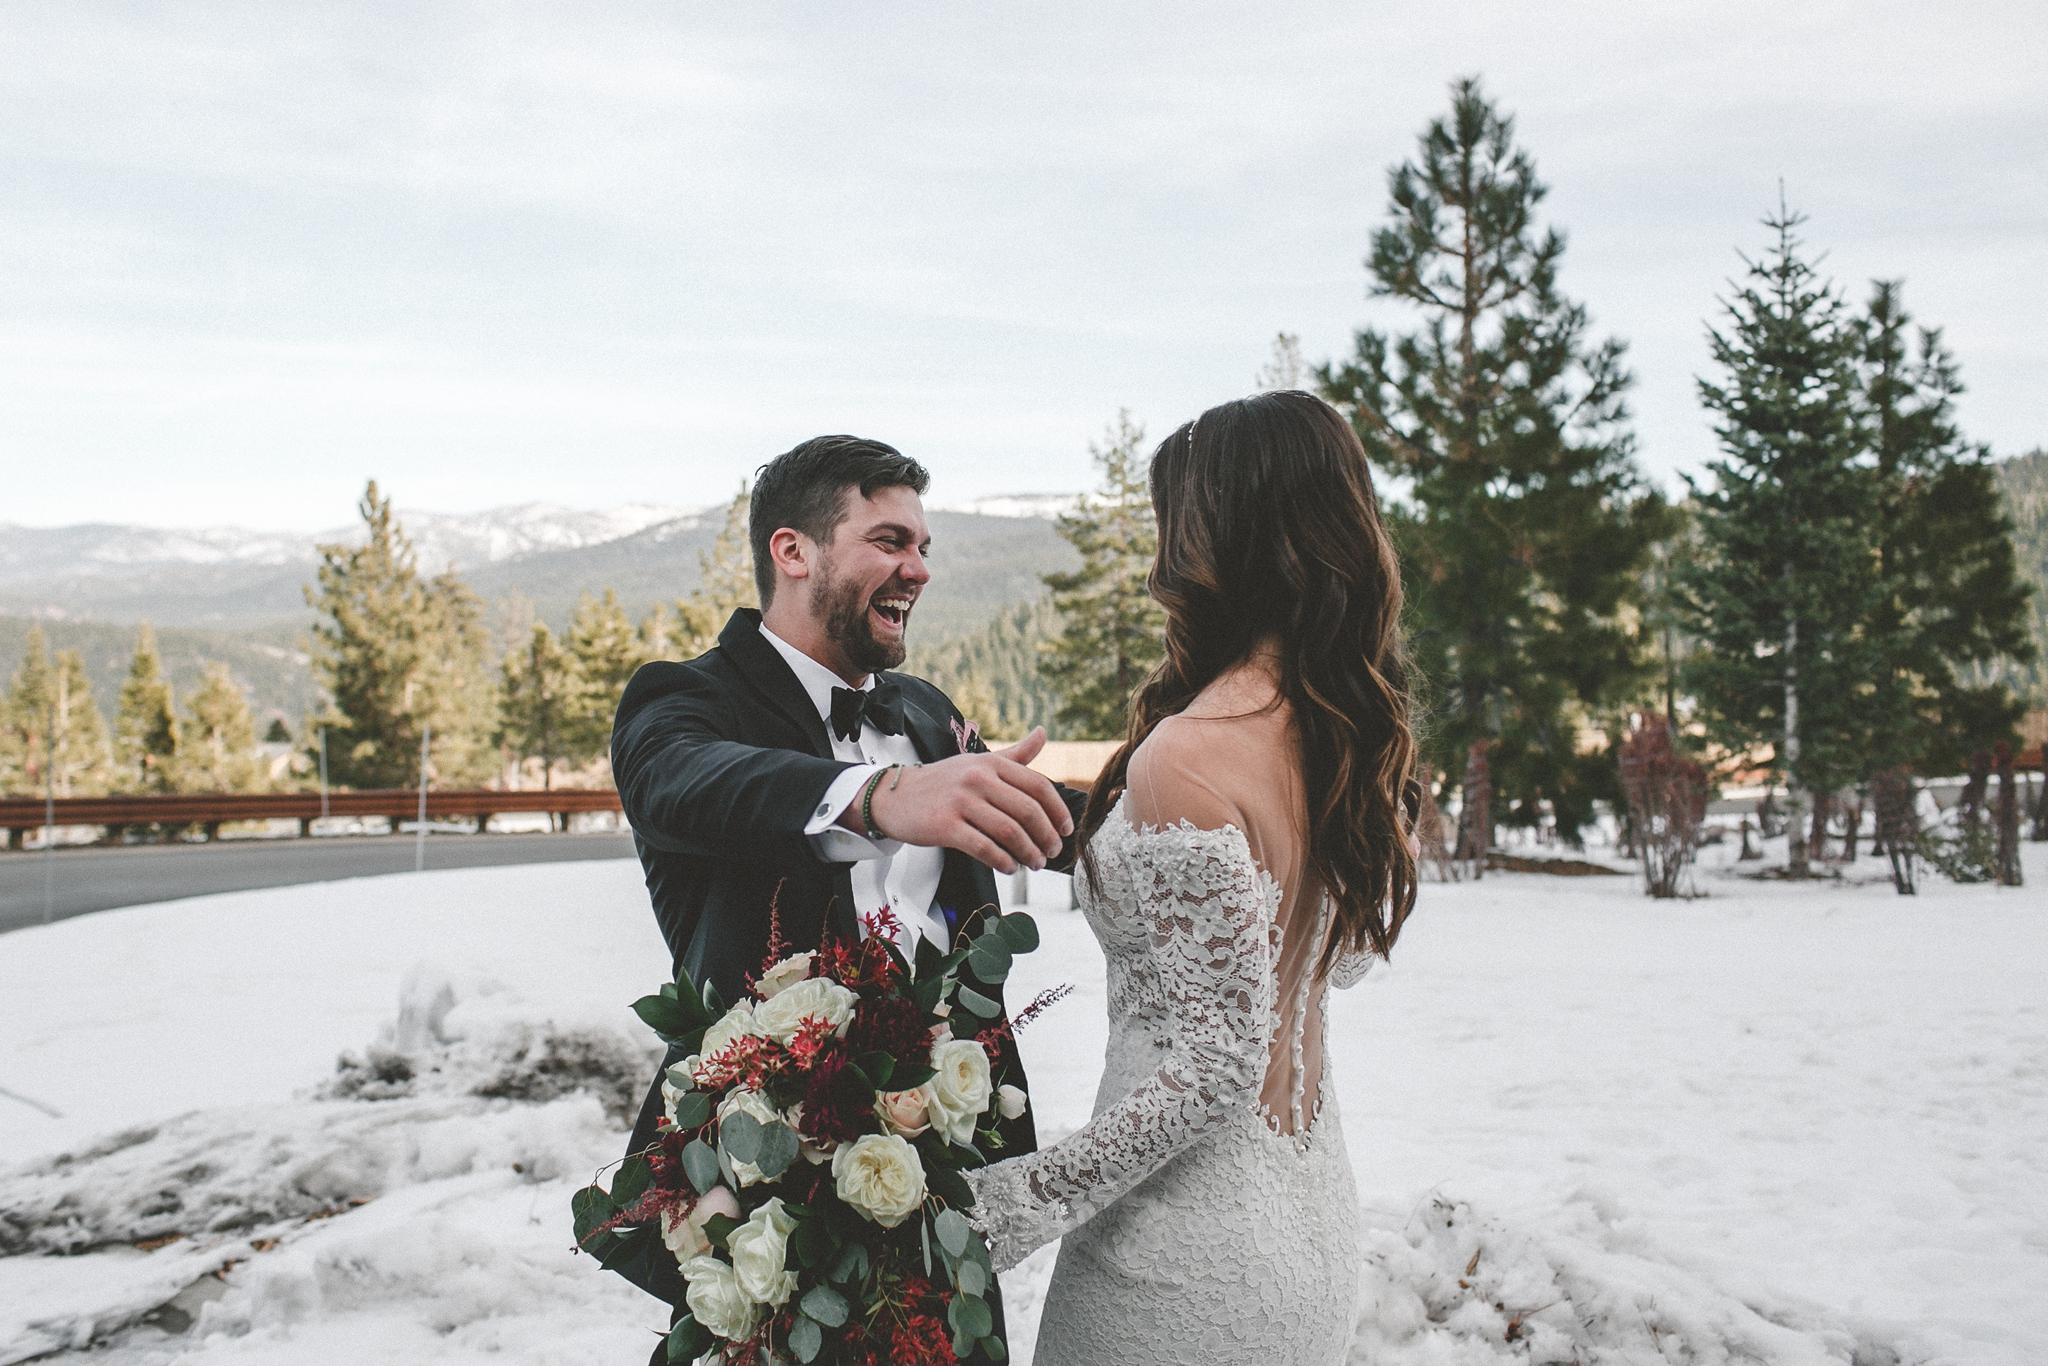 lake_tahoe_wedding_photographer_0037.jpg